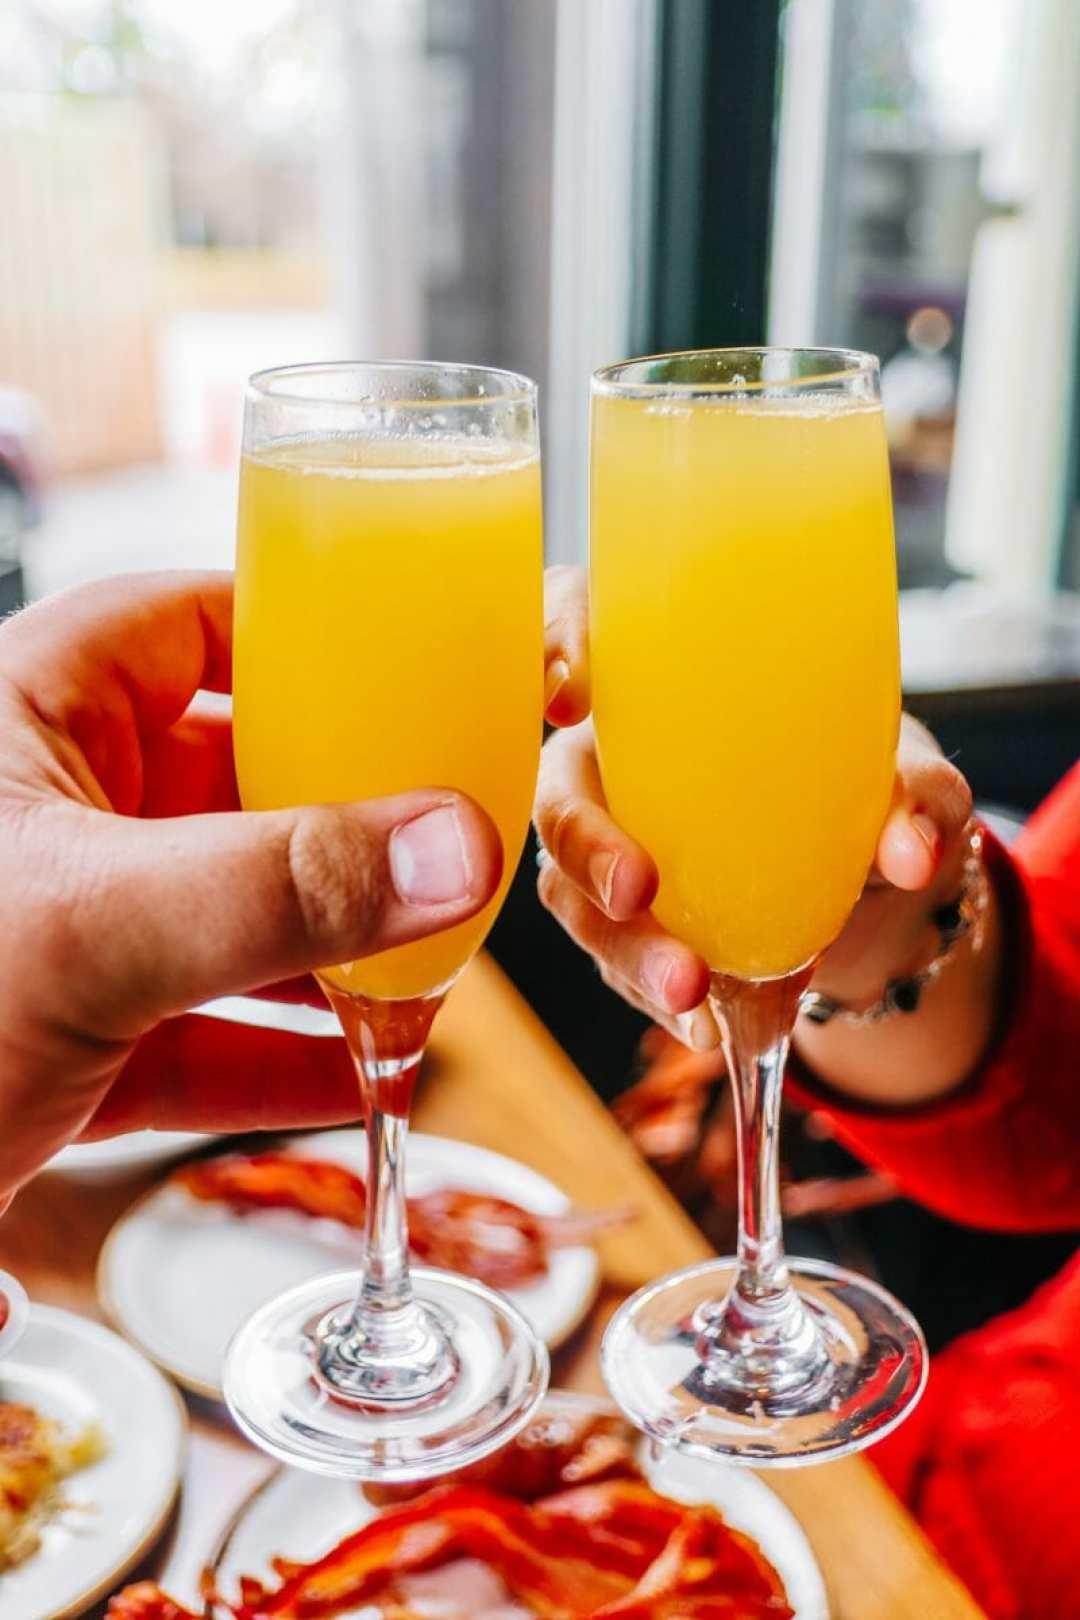 St. Louis mimosas